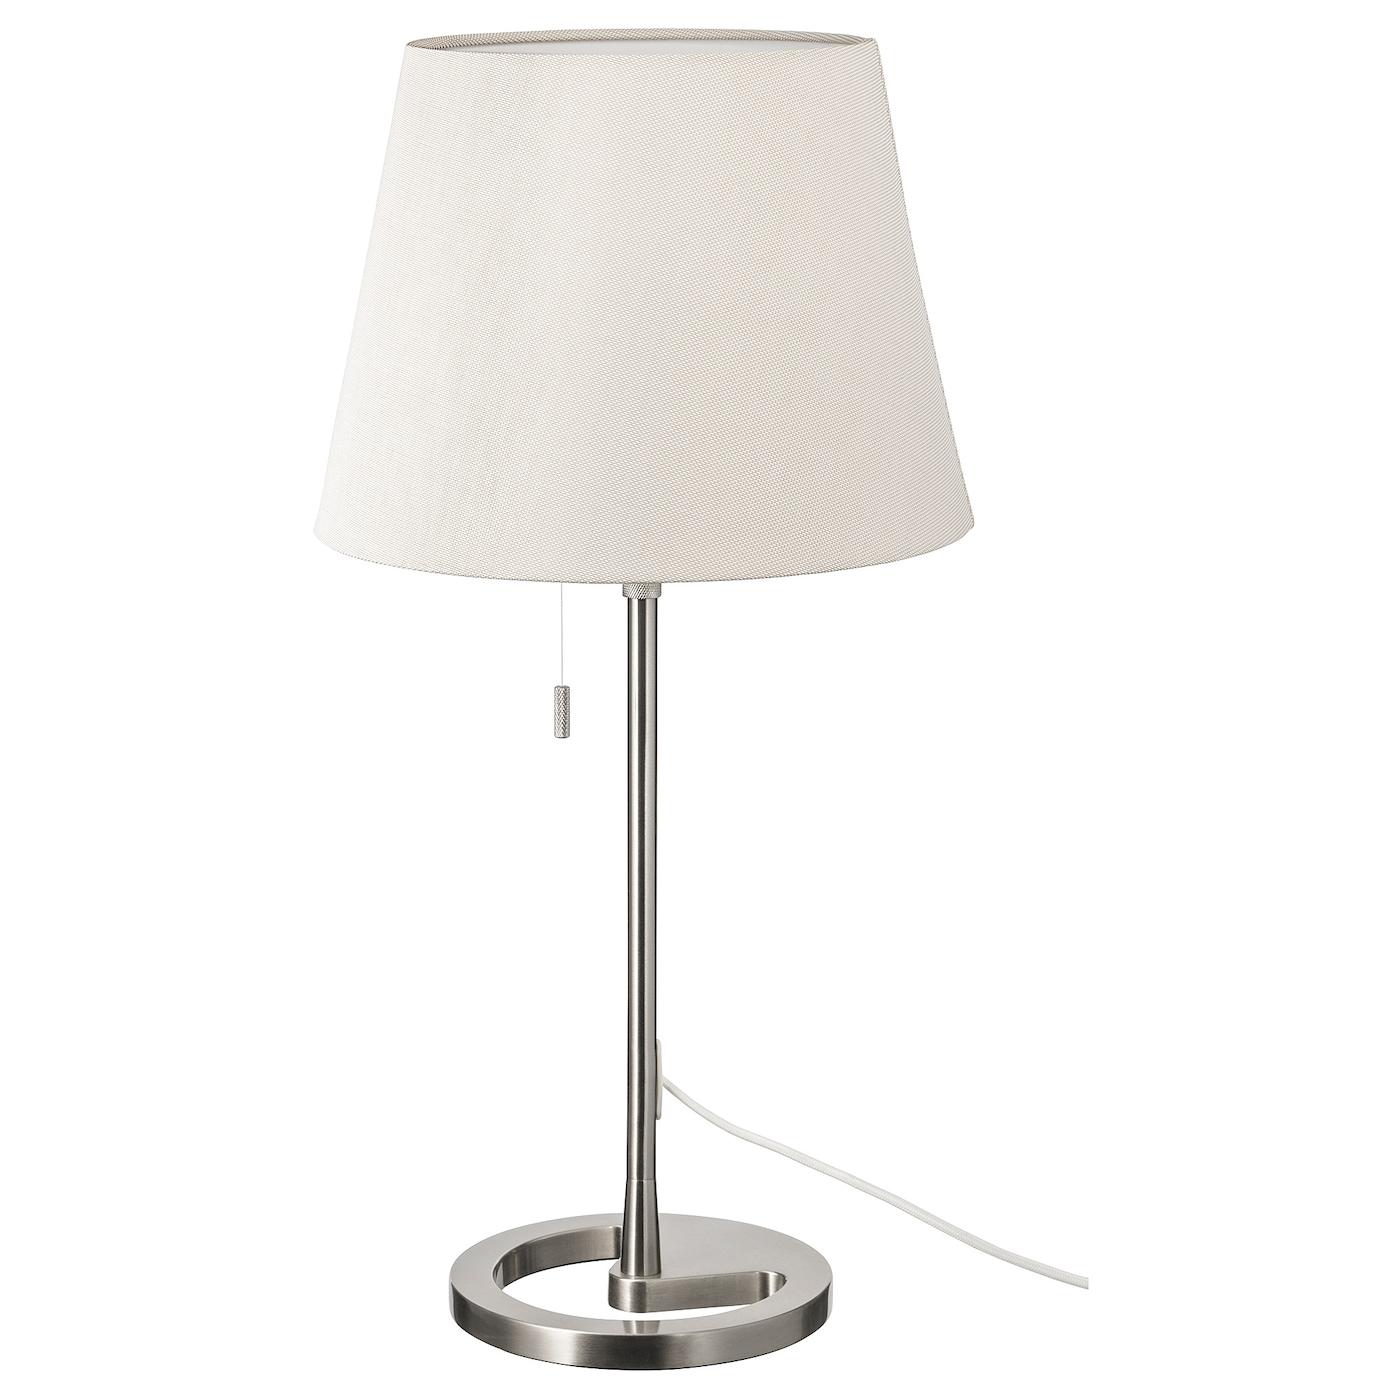 IKEA NYFORS Table lamp, nickel plated